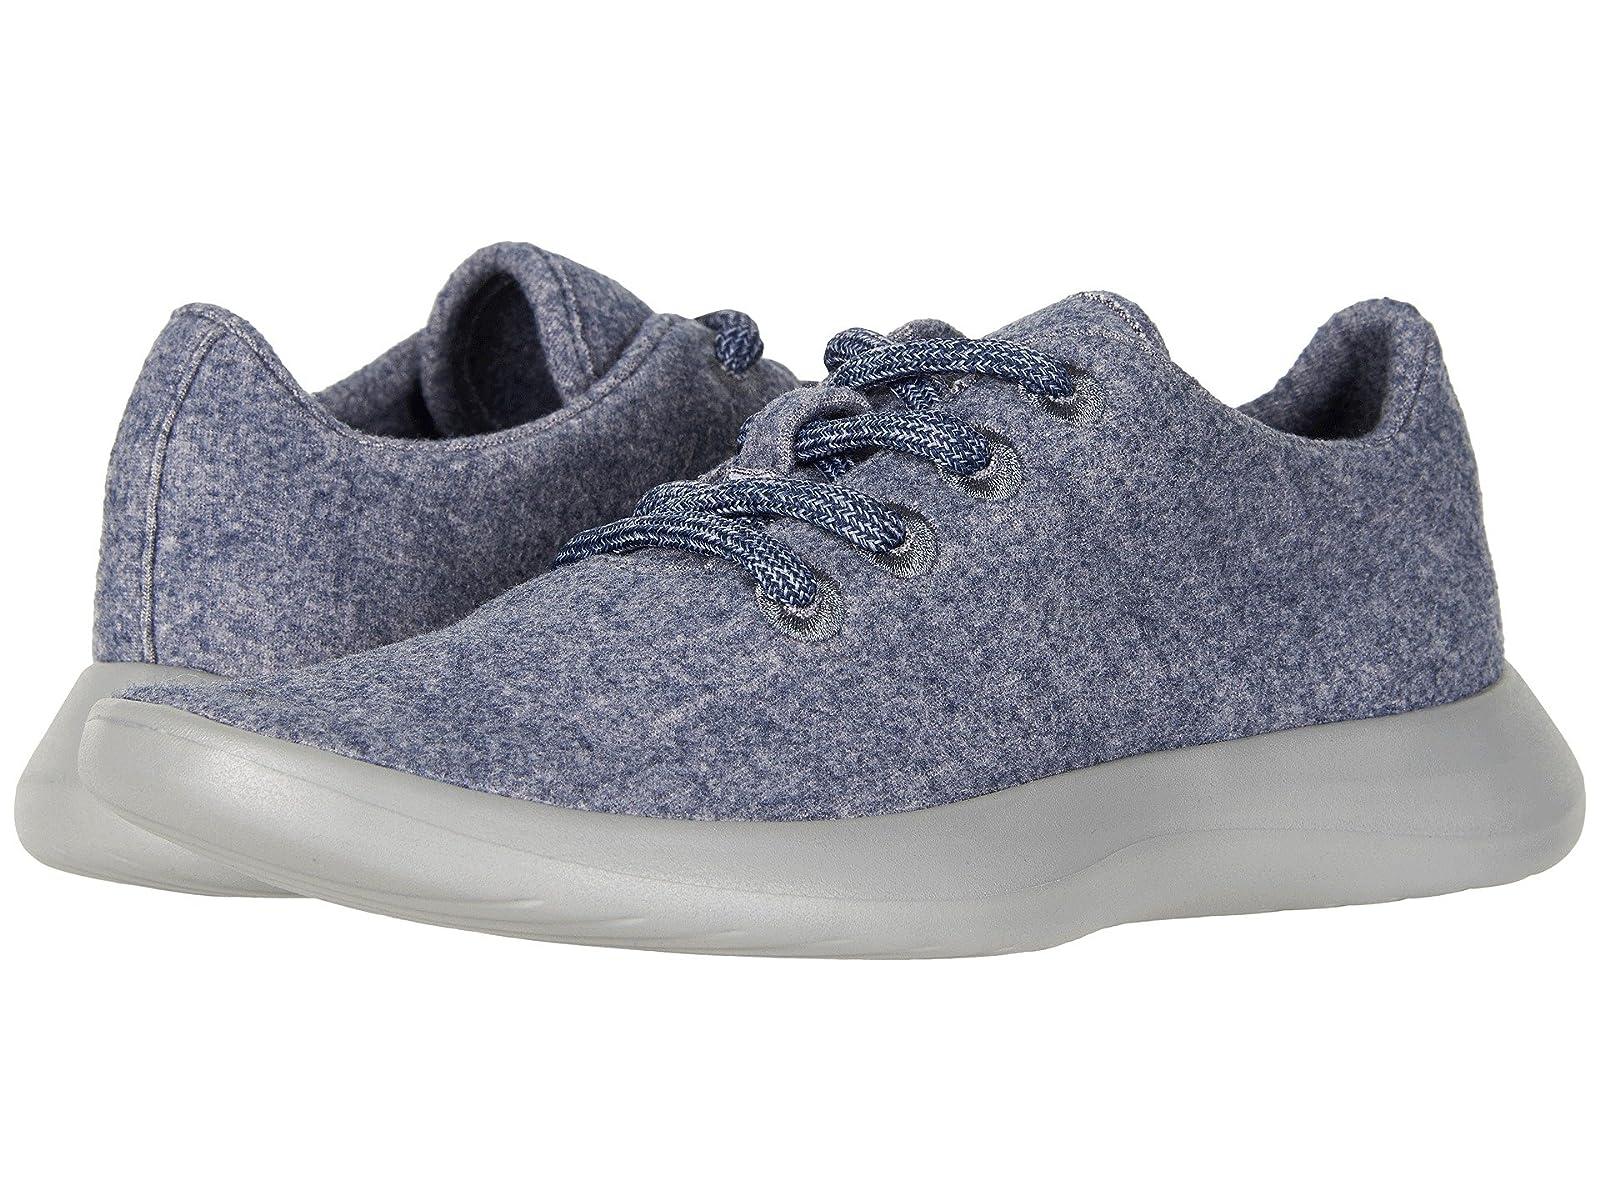 Steven TravelerCheap and distinctive eye-catching shoes